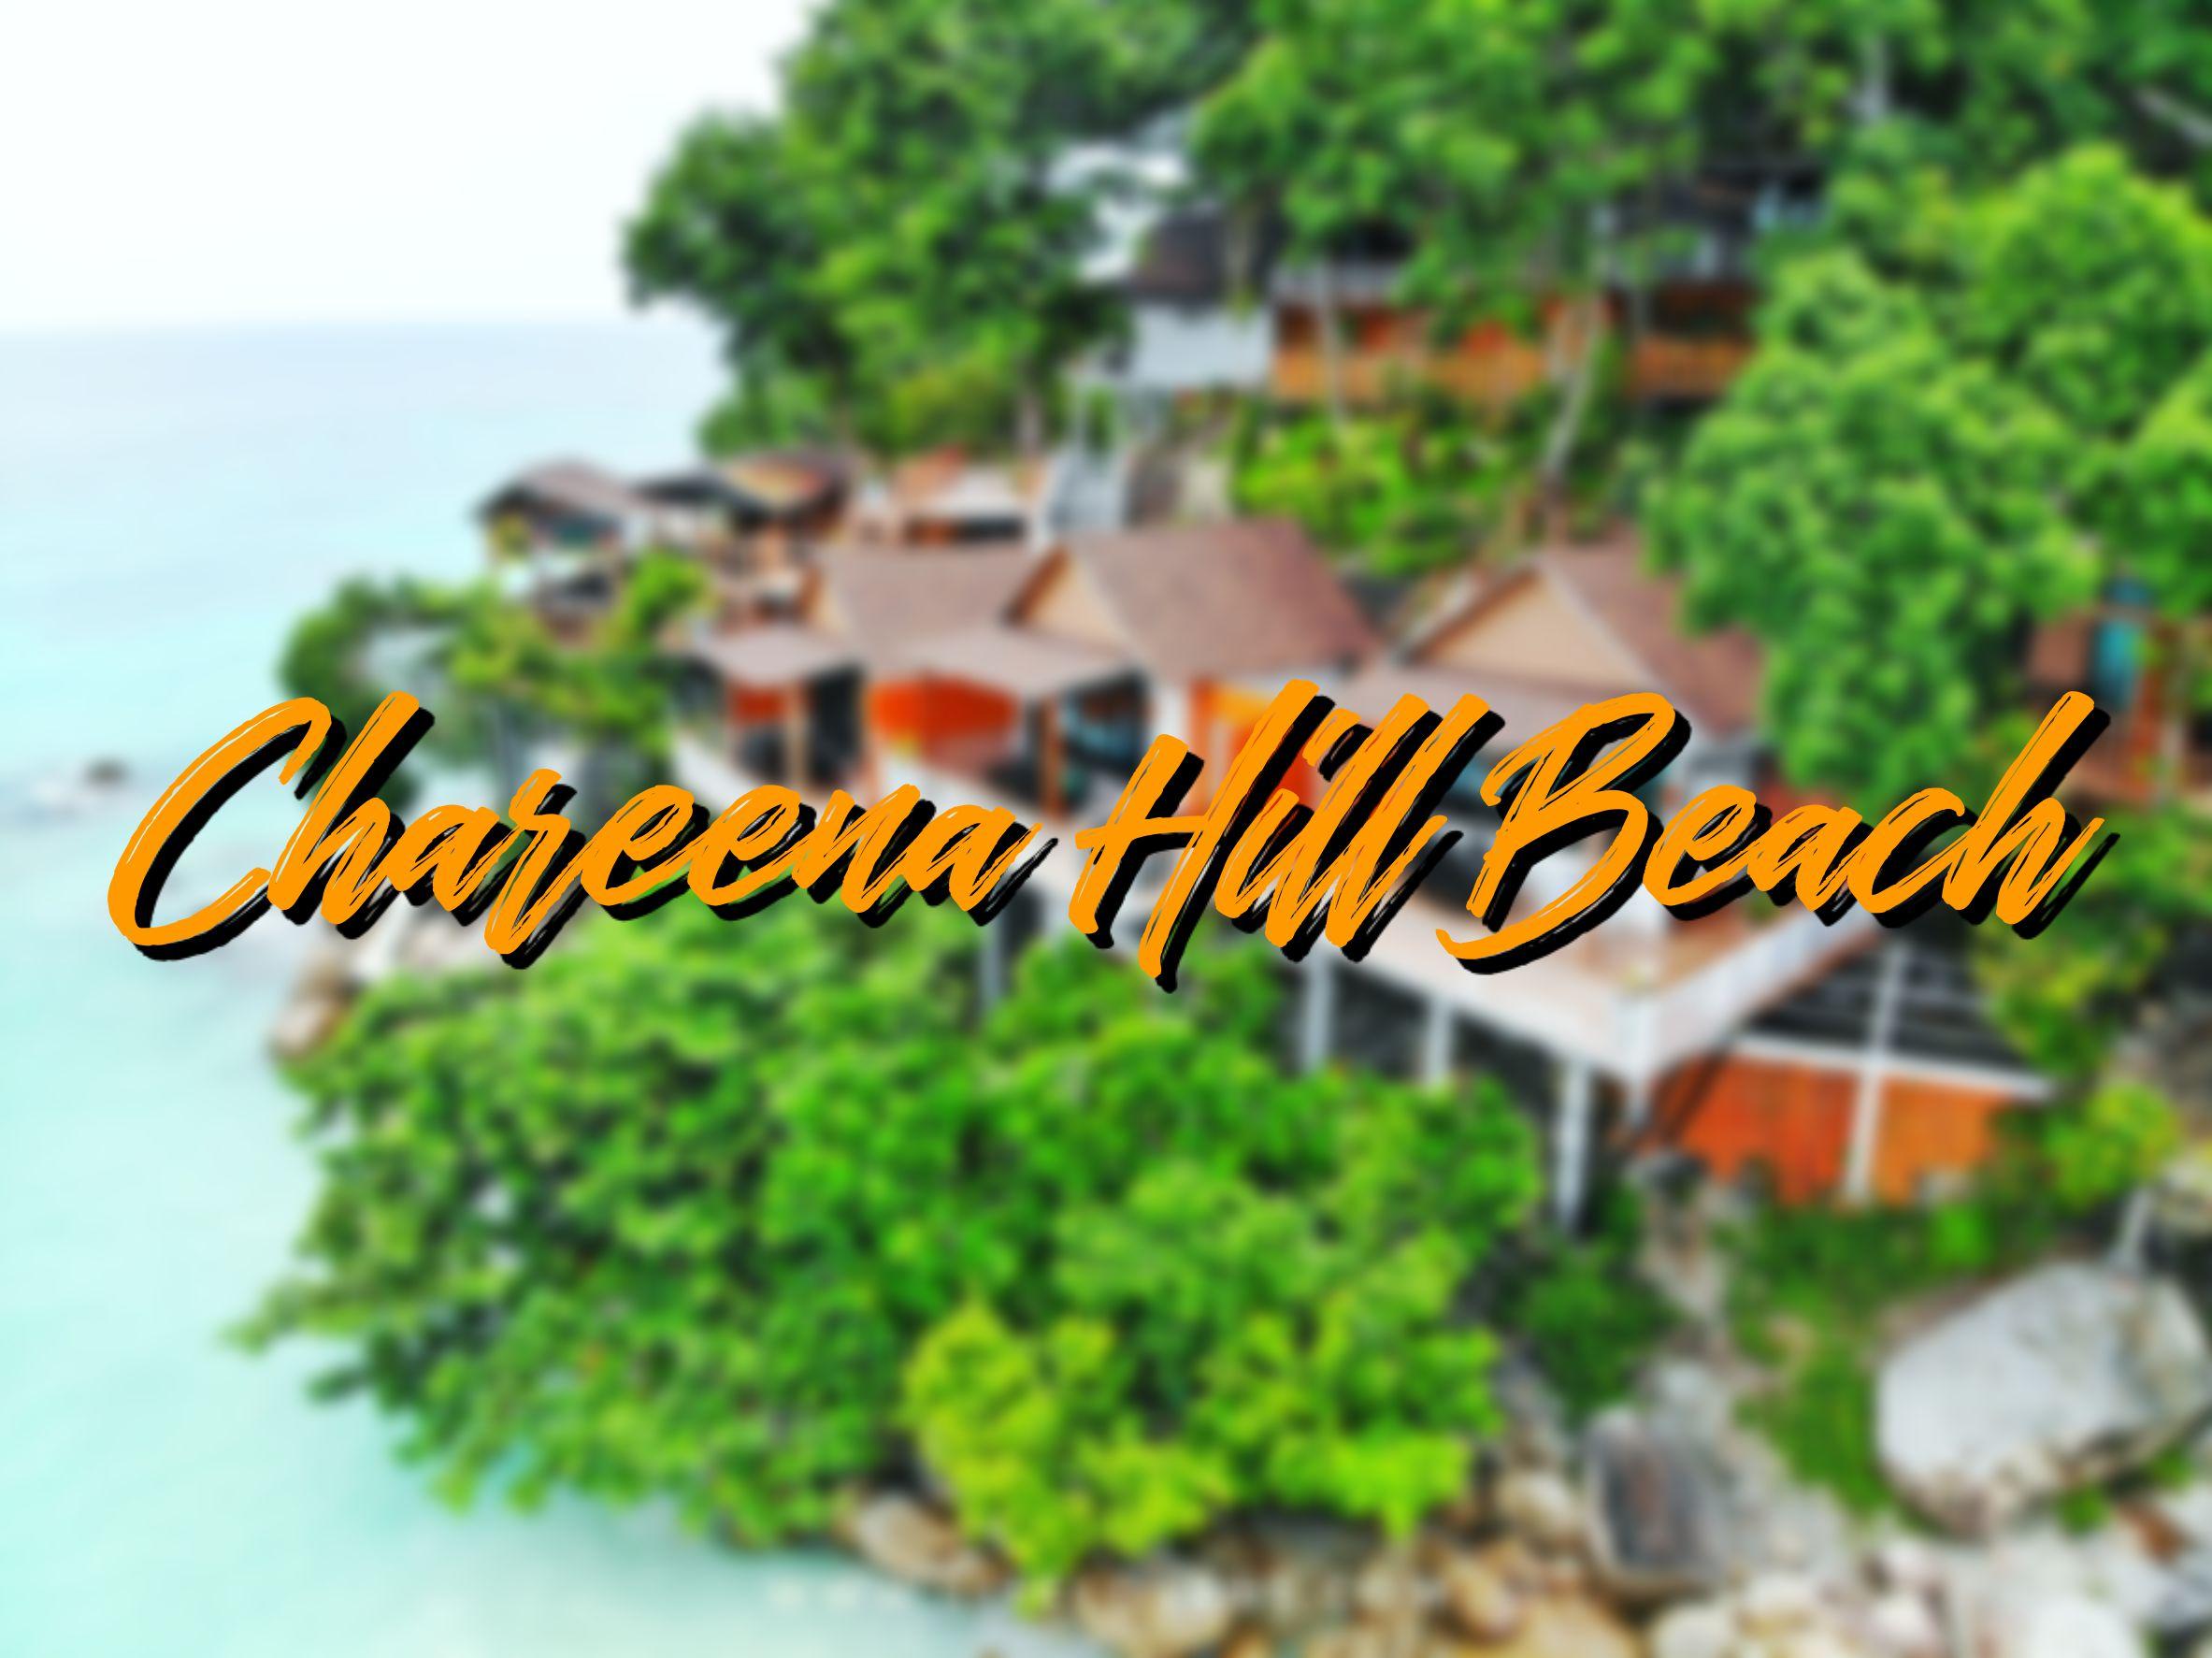 Chareena Hill Beach